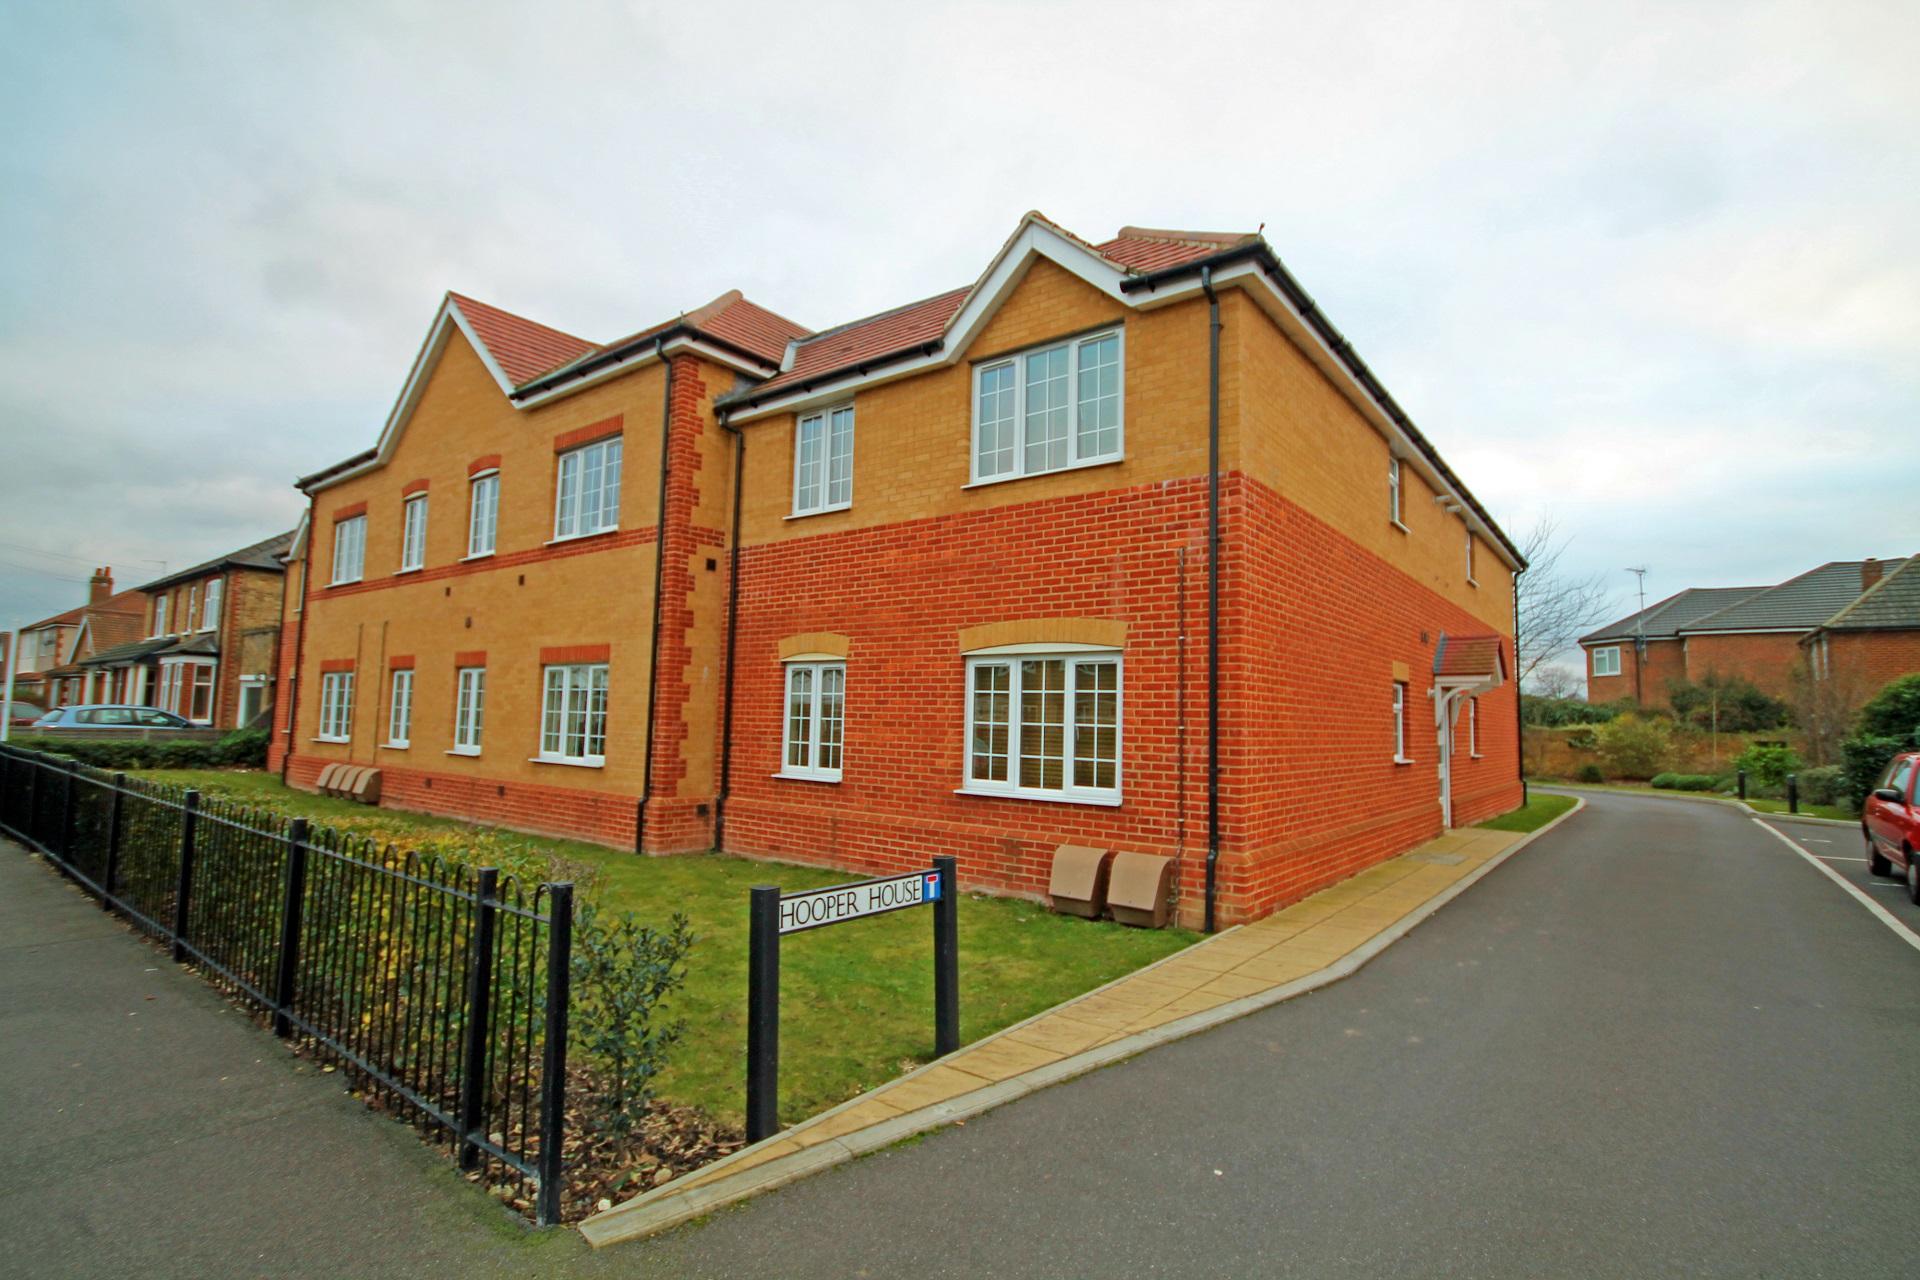 Hooper House - Sold